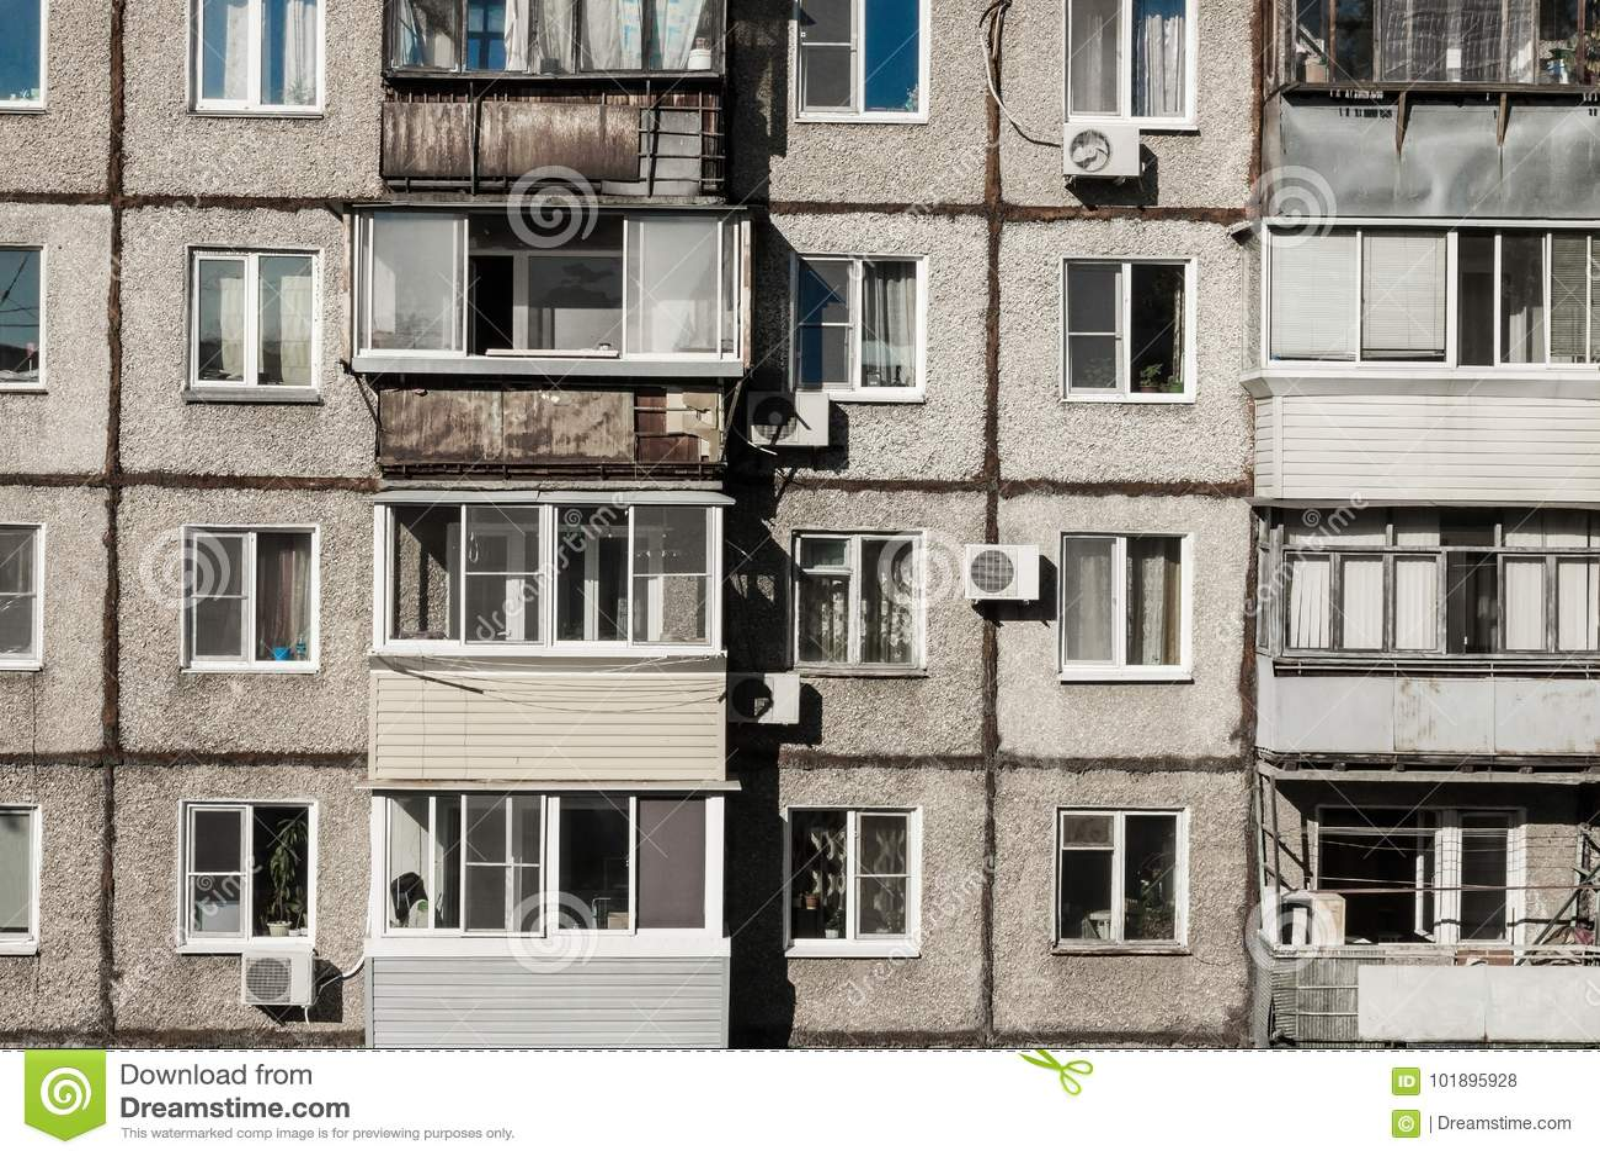 Alojamento velho, pobre, barato